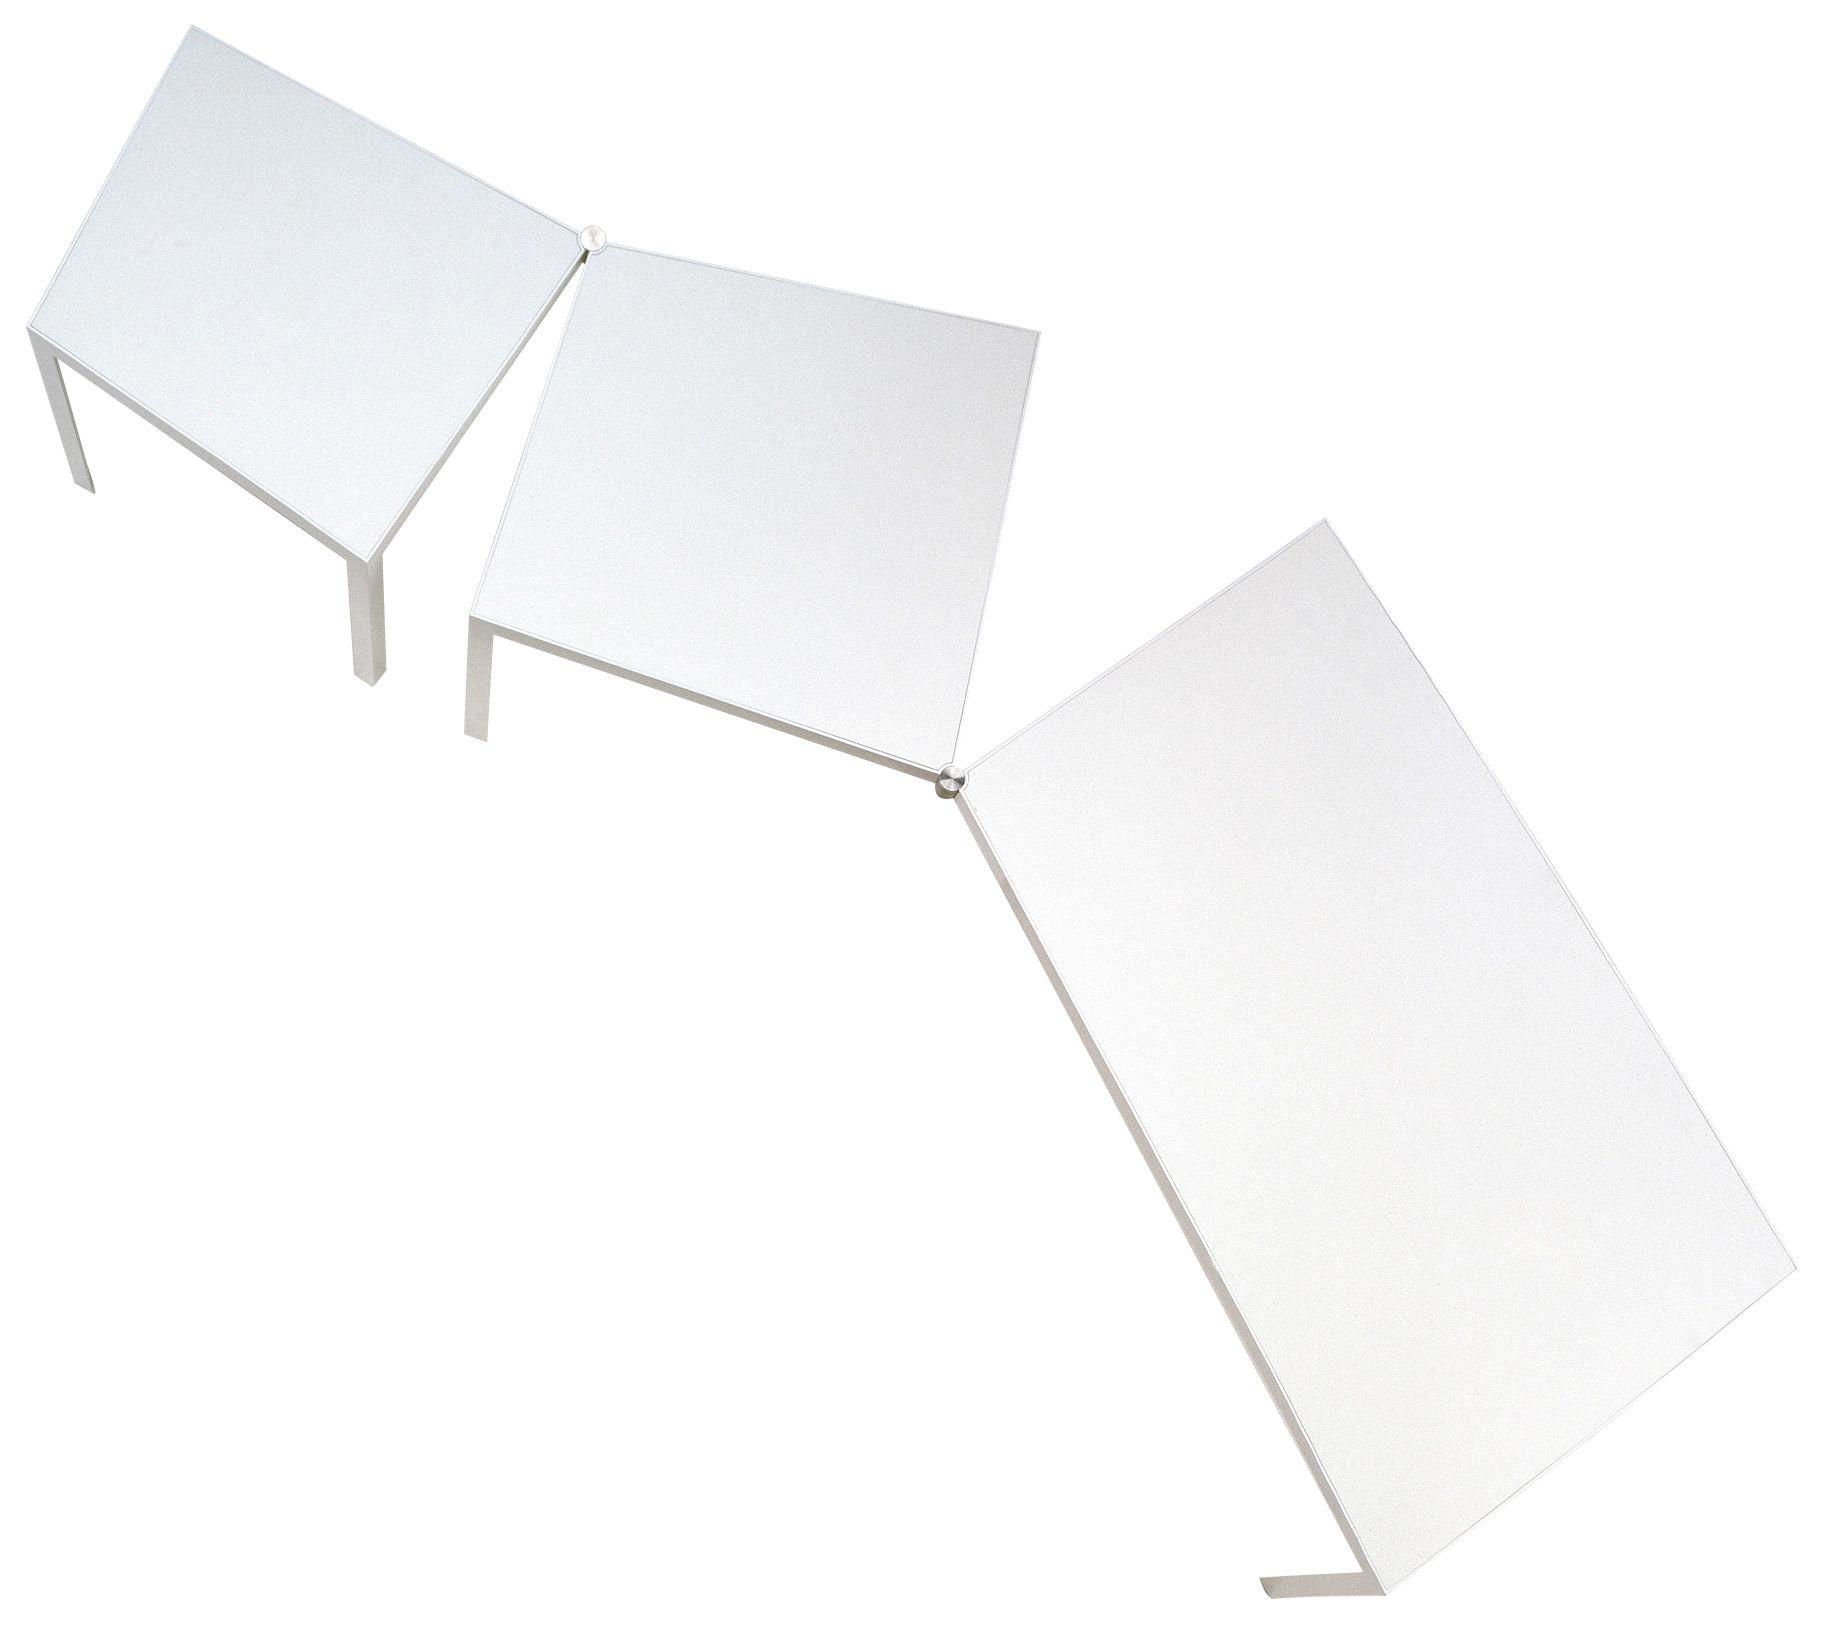 Mobilier - Bureaux - Table Campo d'Oro / Bureau - Modulable - De Padova - Blanc - Aluminium finition laminé